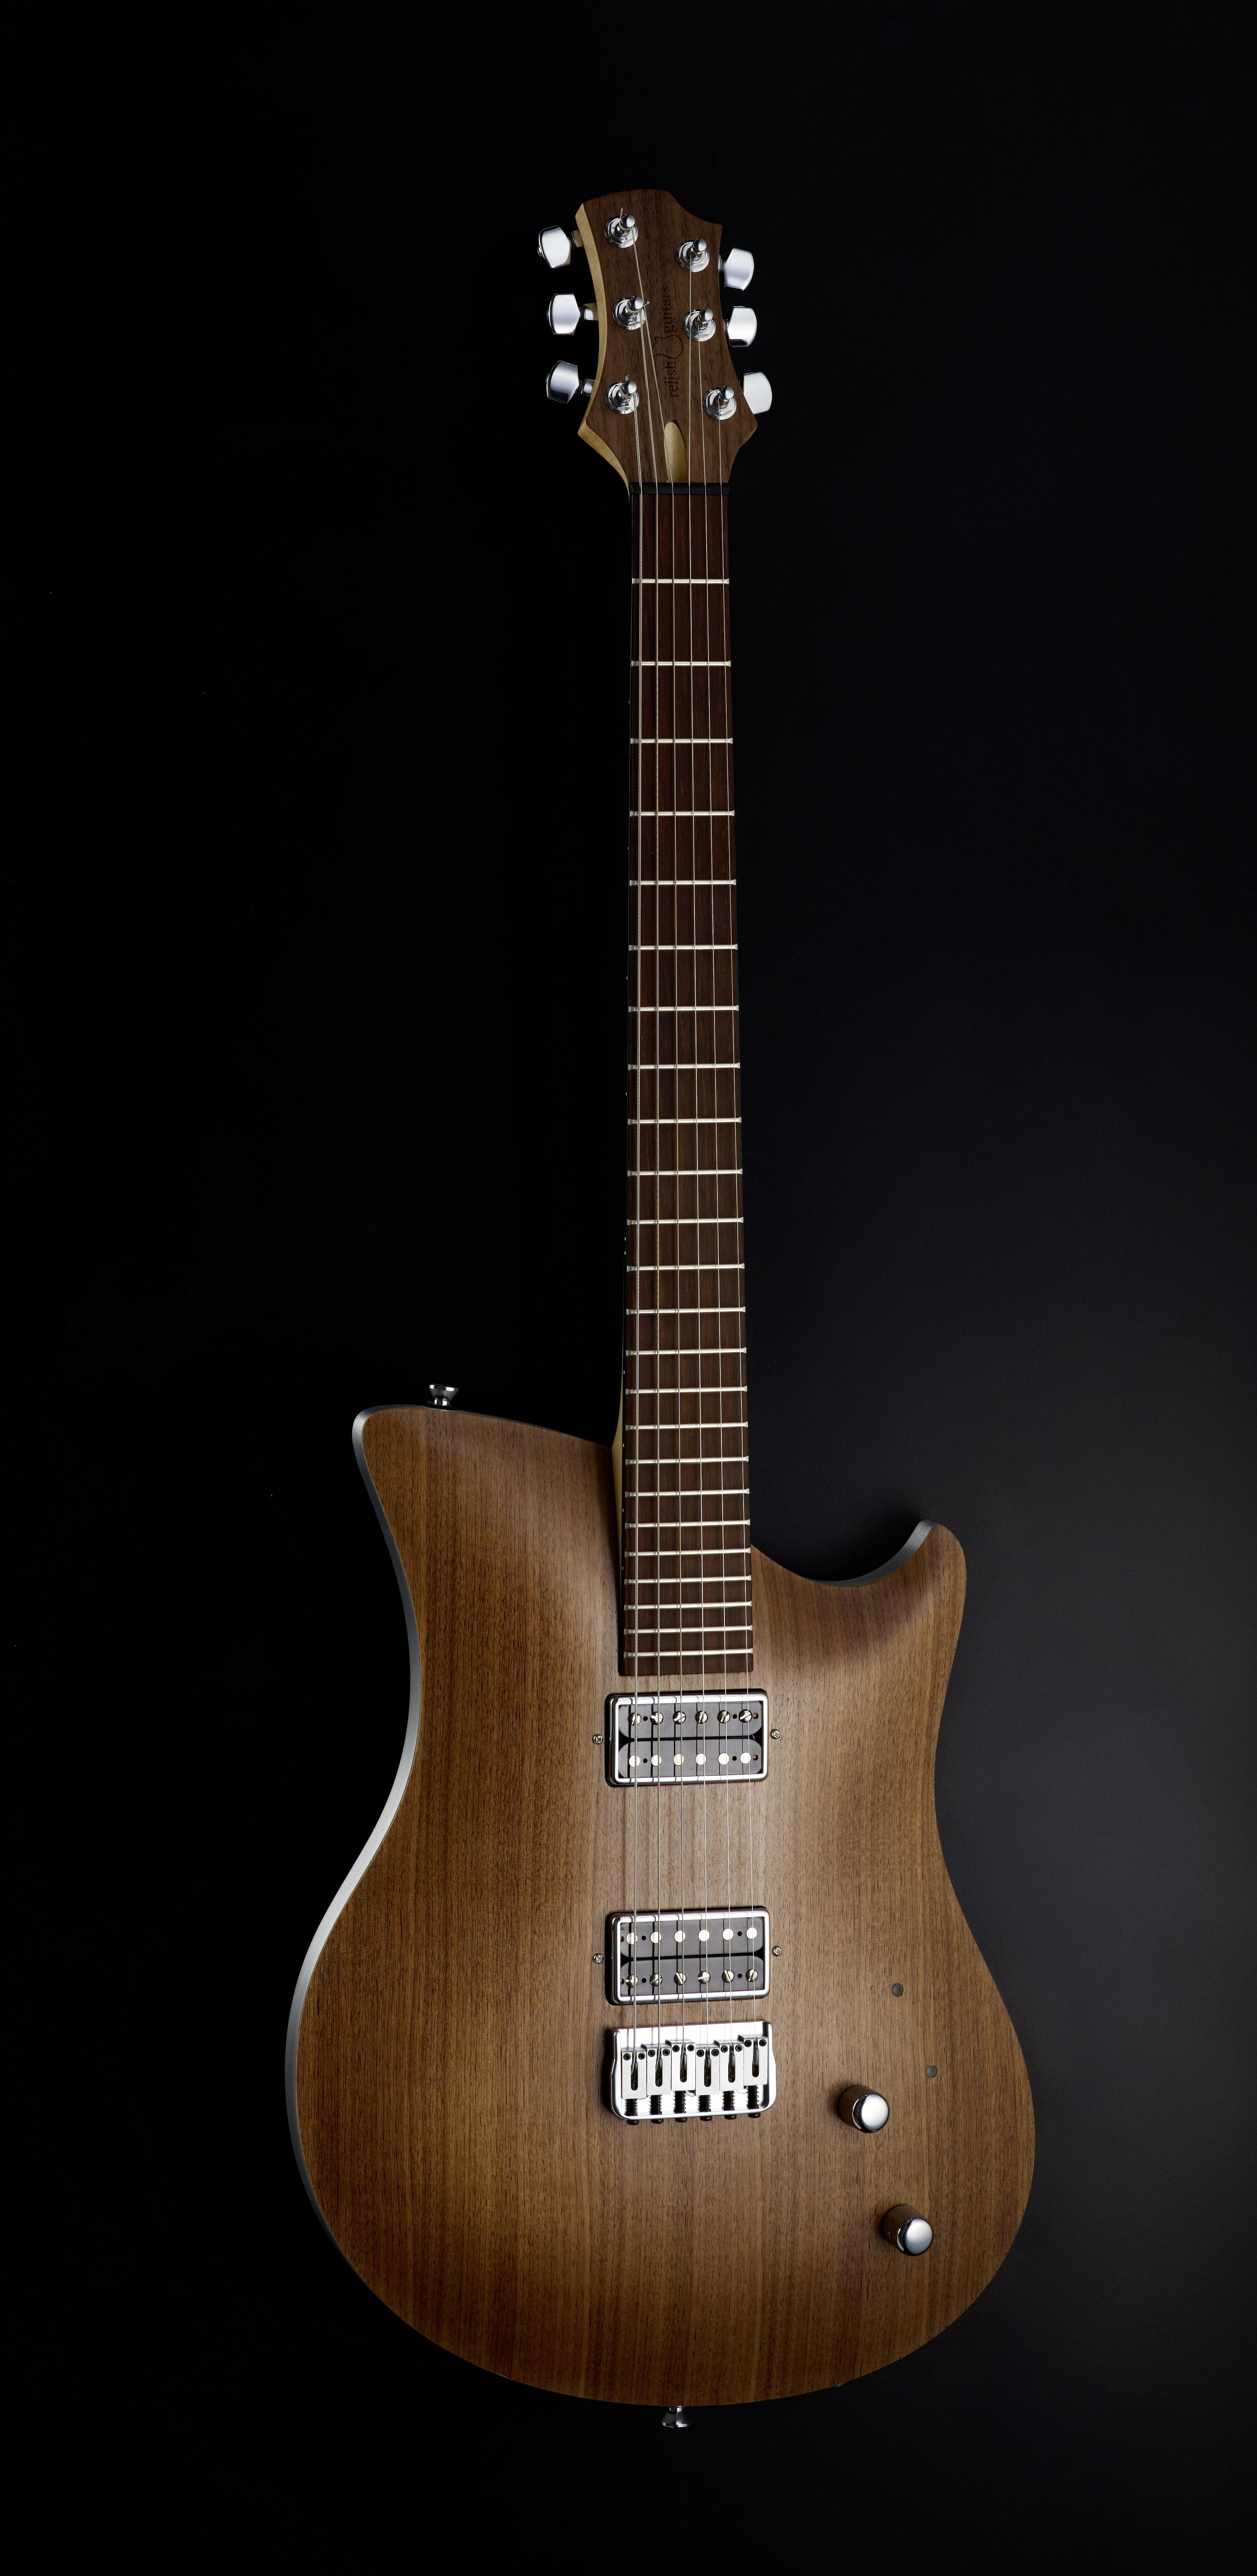 Relish_Guitars_walnut_front_dark.jpg